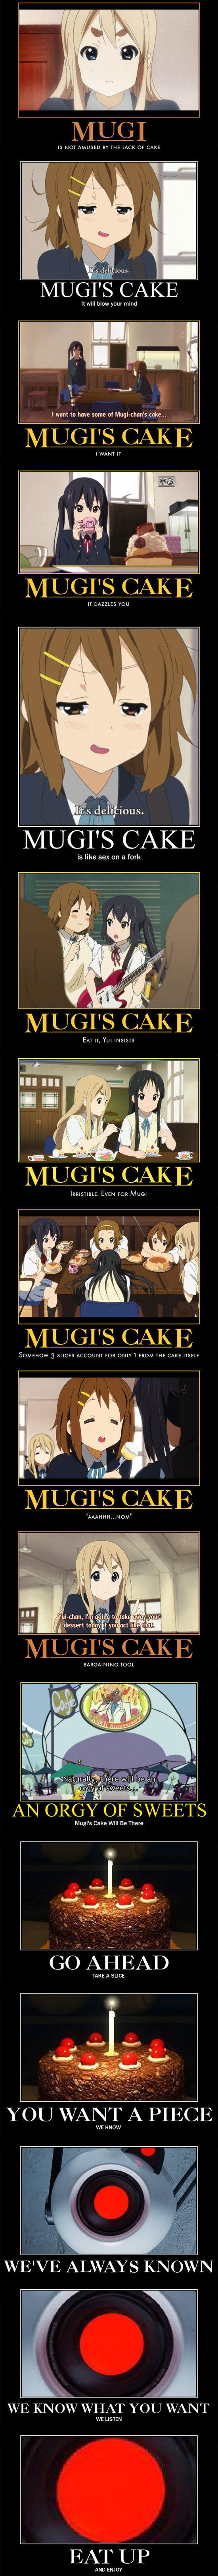 Mugi's Cake. Is it a Lie? (K-On Mots are not mine, portal mots are original) I was torn between animemanga and morbid-channel, I thought it wasn't creepy enough Anime mot posters k on mugi Cake Portal OC creepy